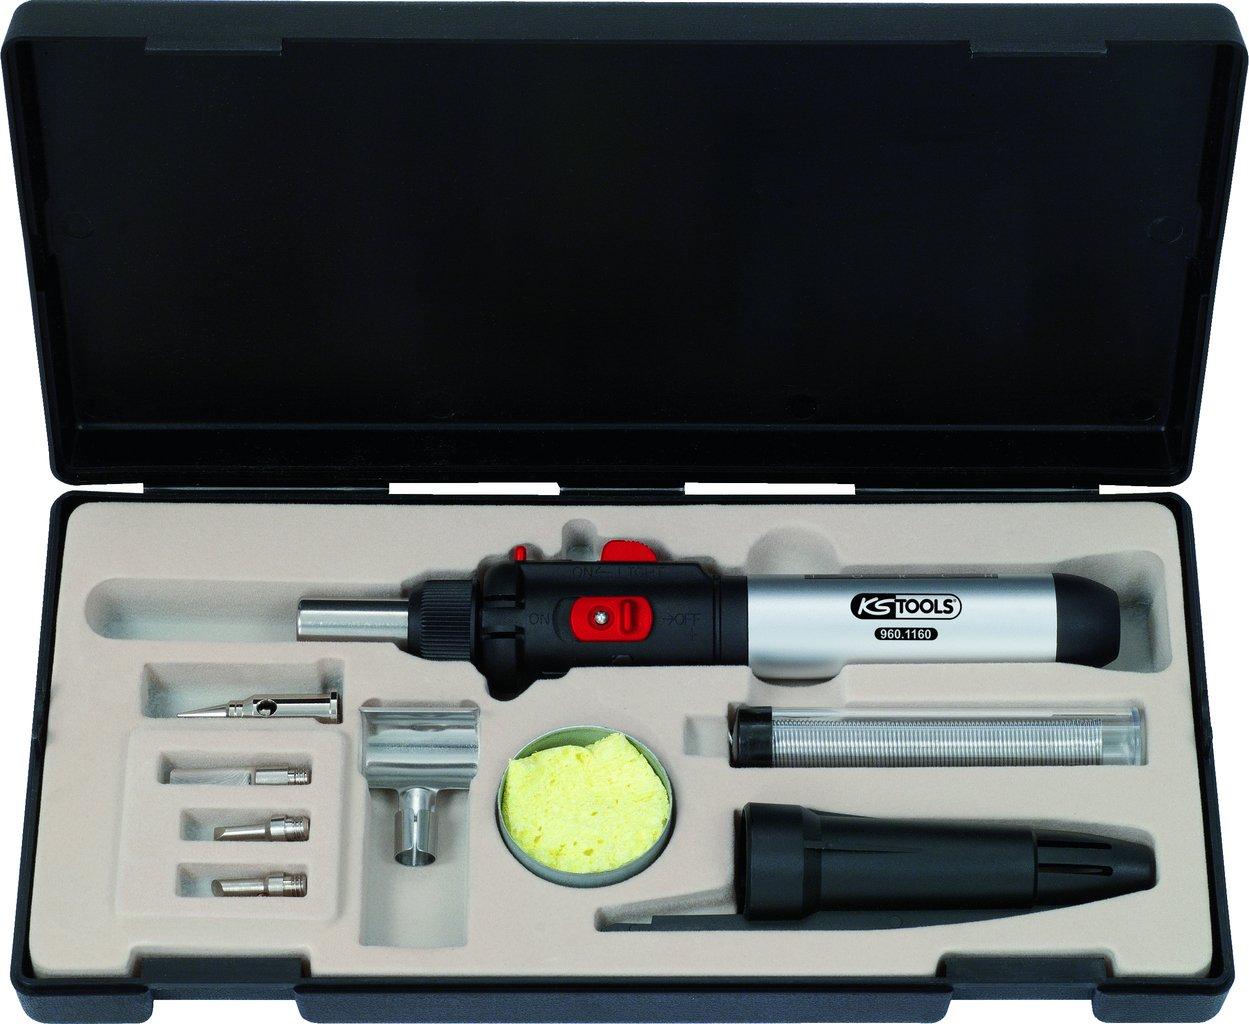 KS Tools 960.1160 Juego de microsoldadura, 10 pzs. 4042146390191